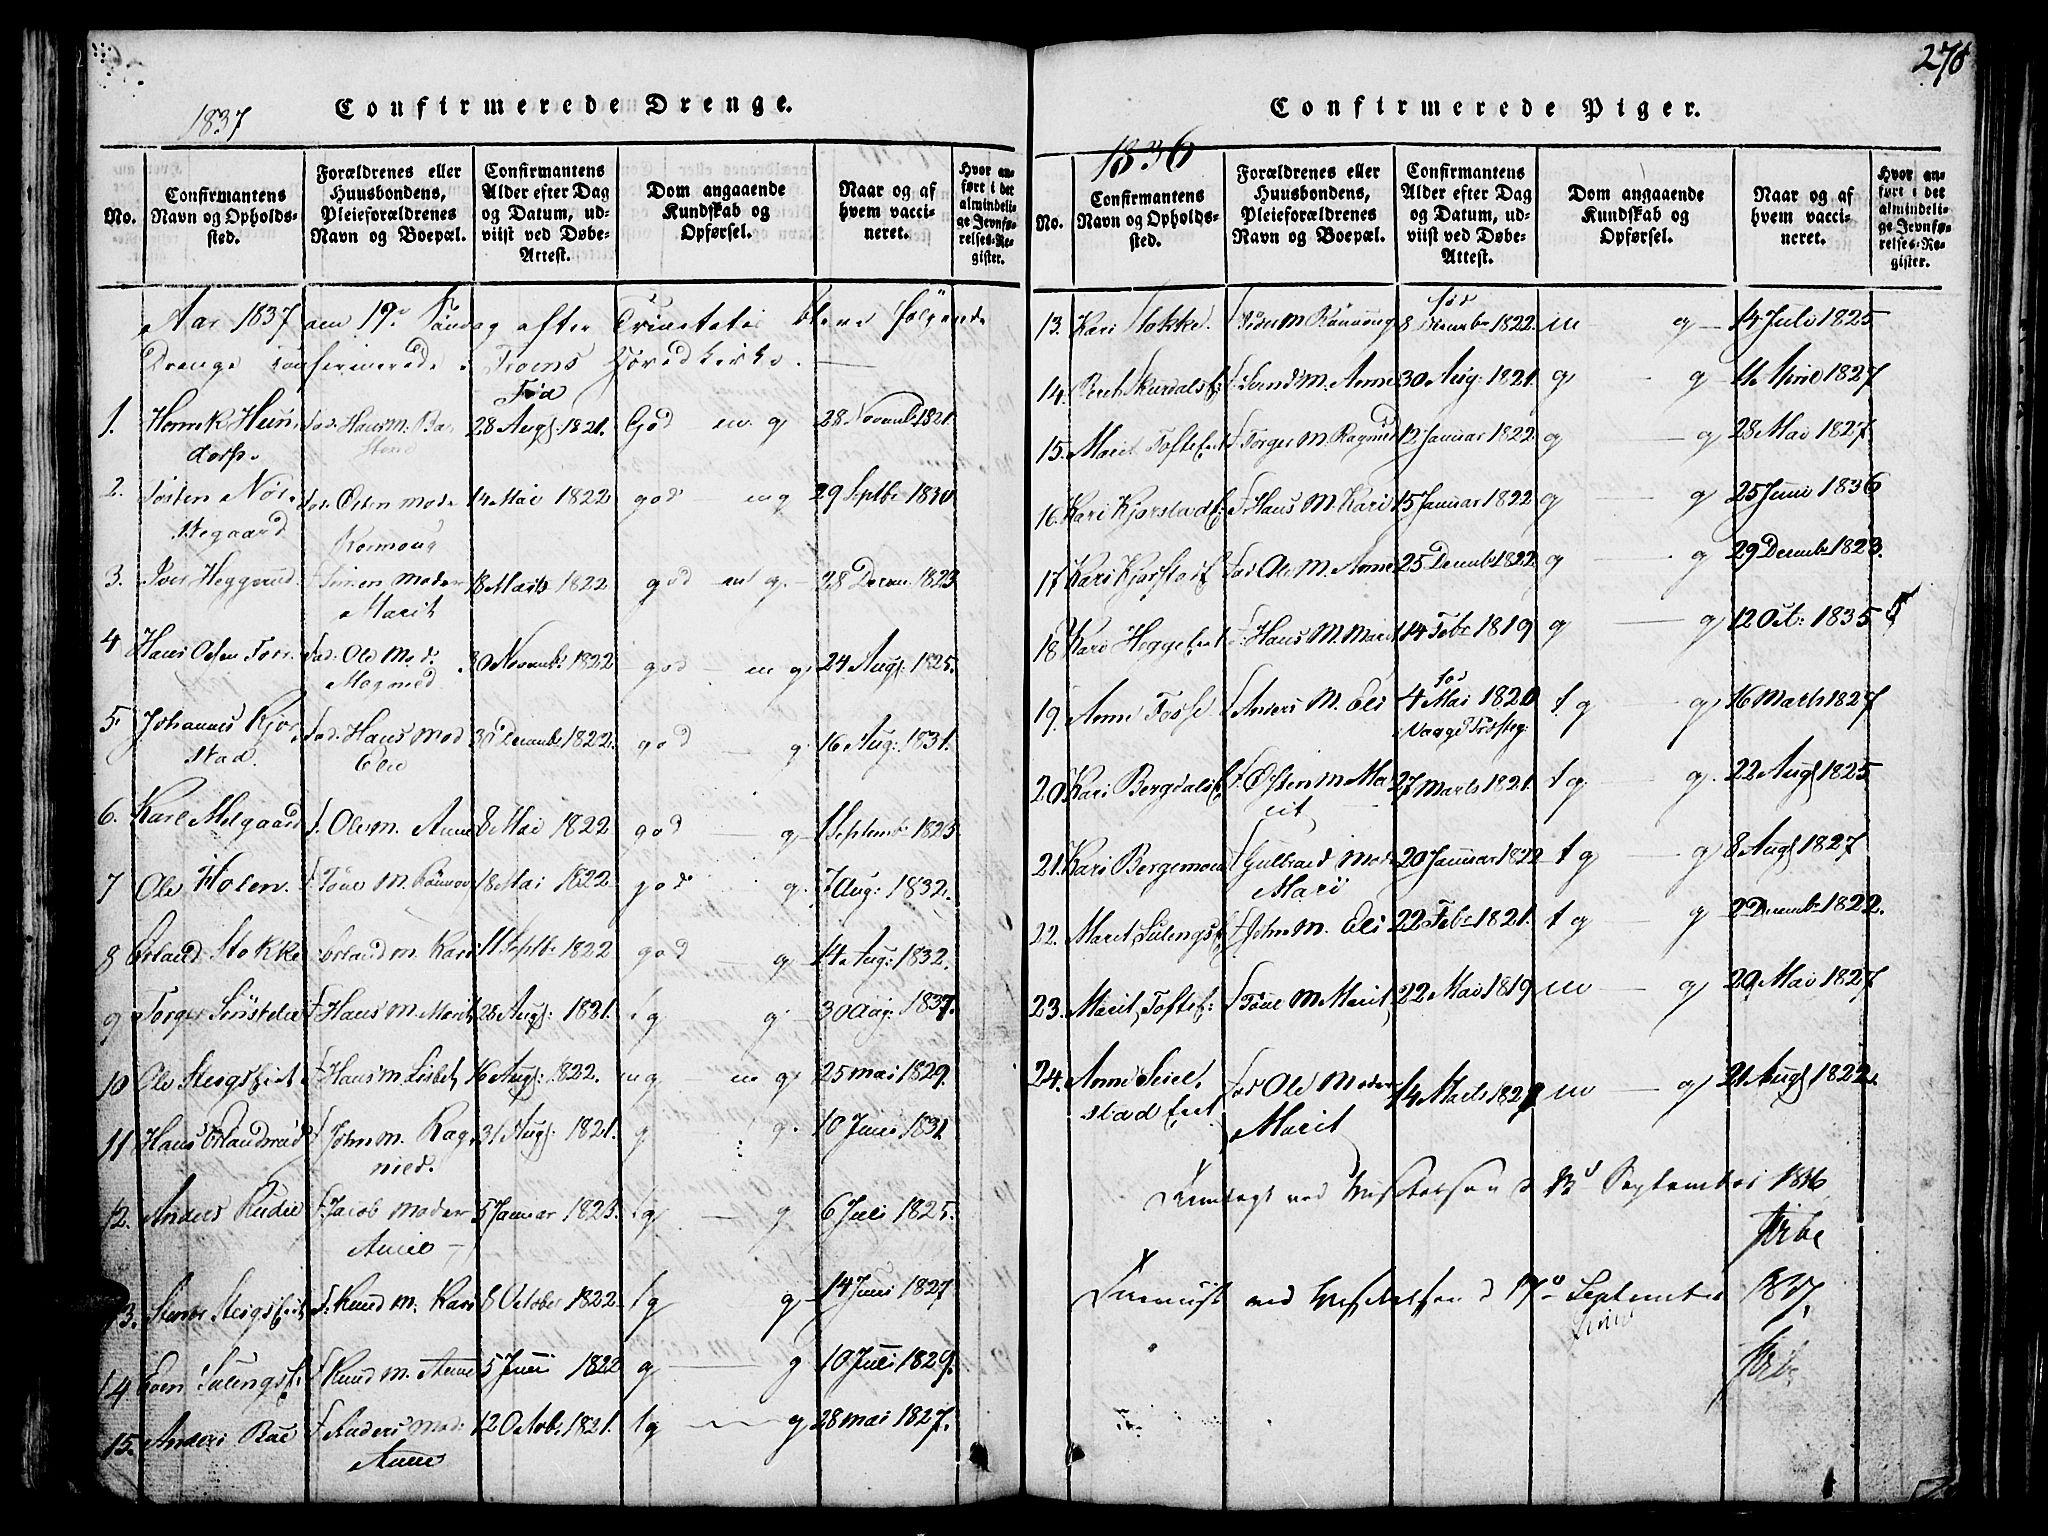 SAH, Fron prestekontor, H/Ha/Hab/L0001: Klokkerbok nr. 1, 1816-1843, s. 270